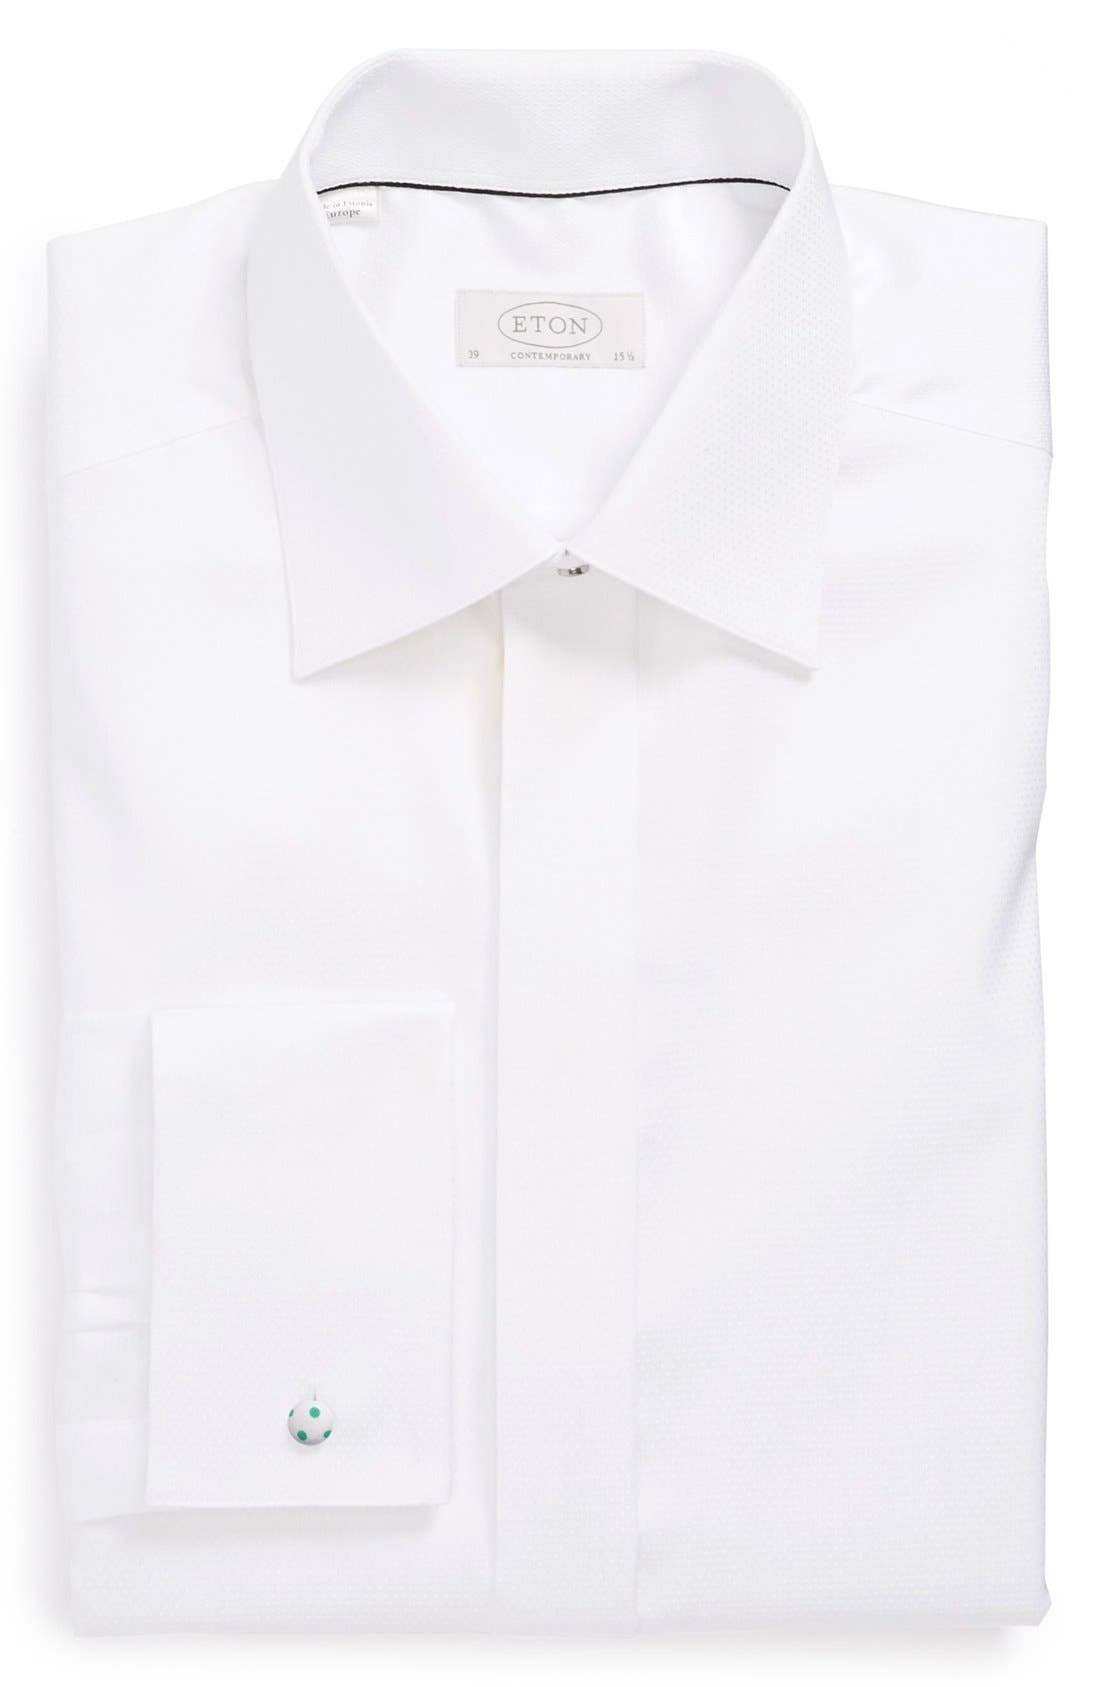 ETON, Contemporary Fit Diamond Weave Tuxedo Shirt, Main thumbnail 1, color, WHITE